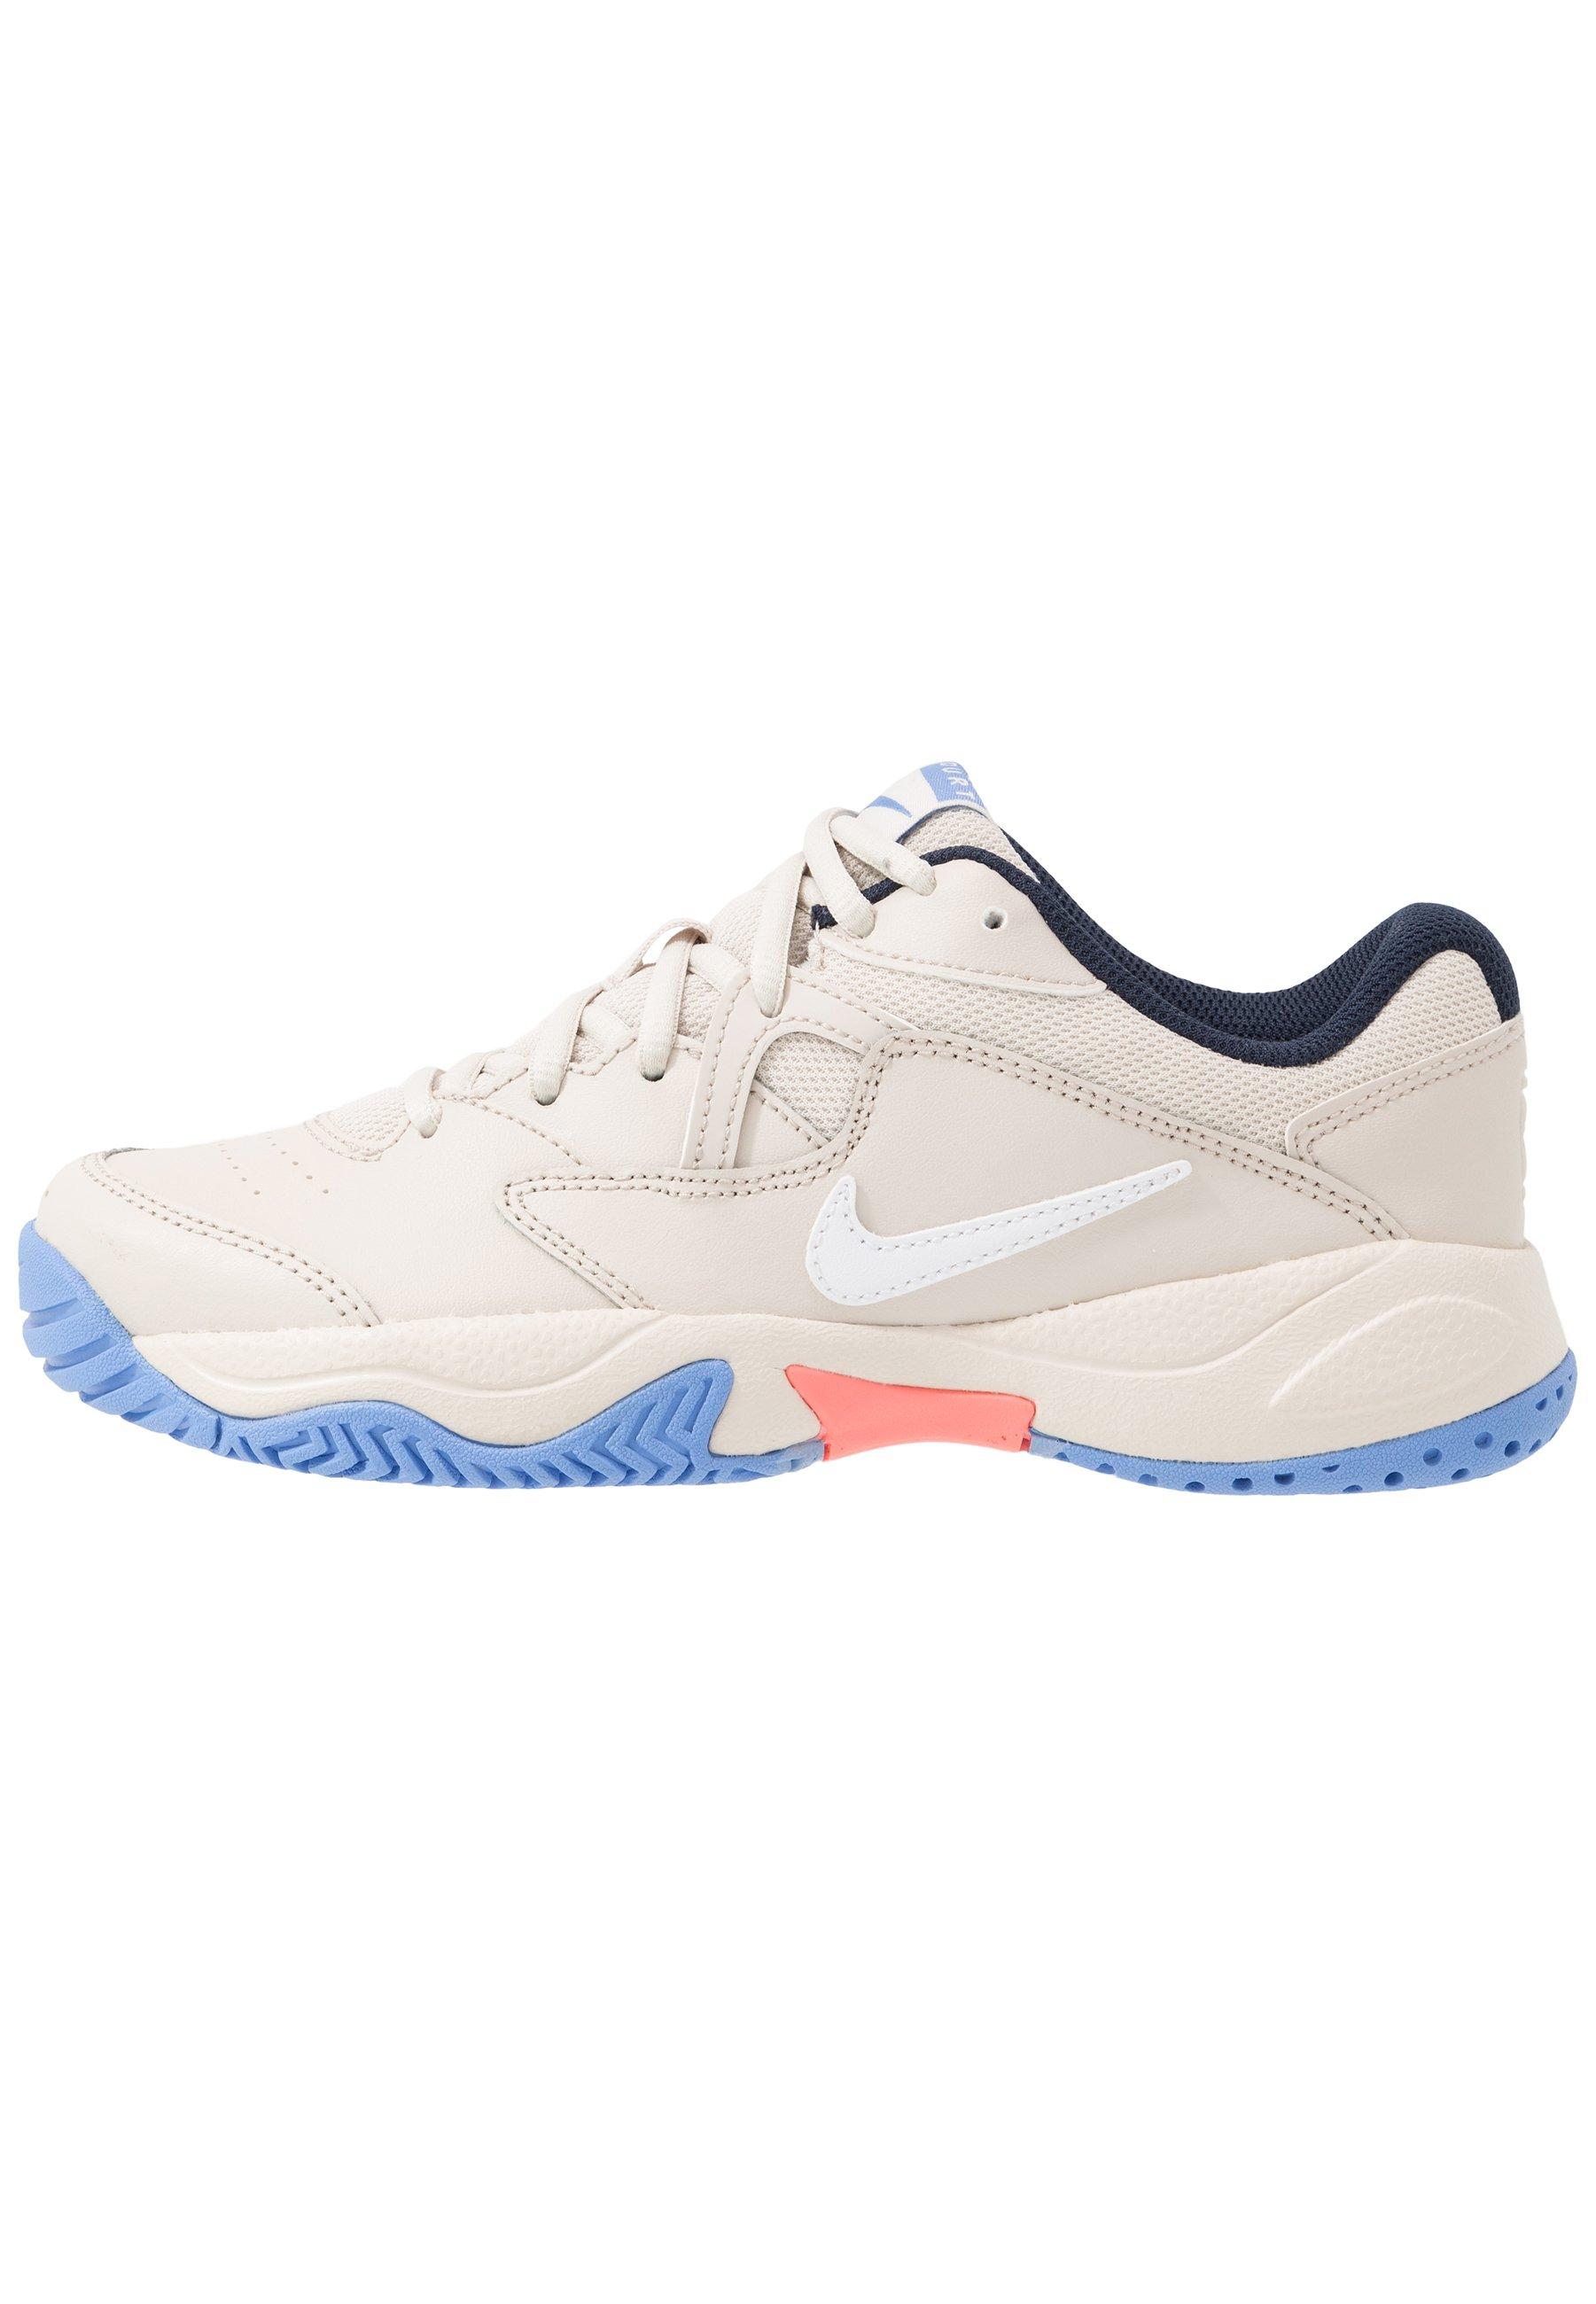 Nike Performance Court Lite 2 - All Tennisskor White/meallic Silver